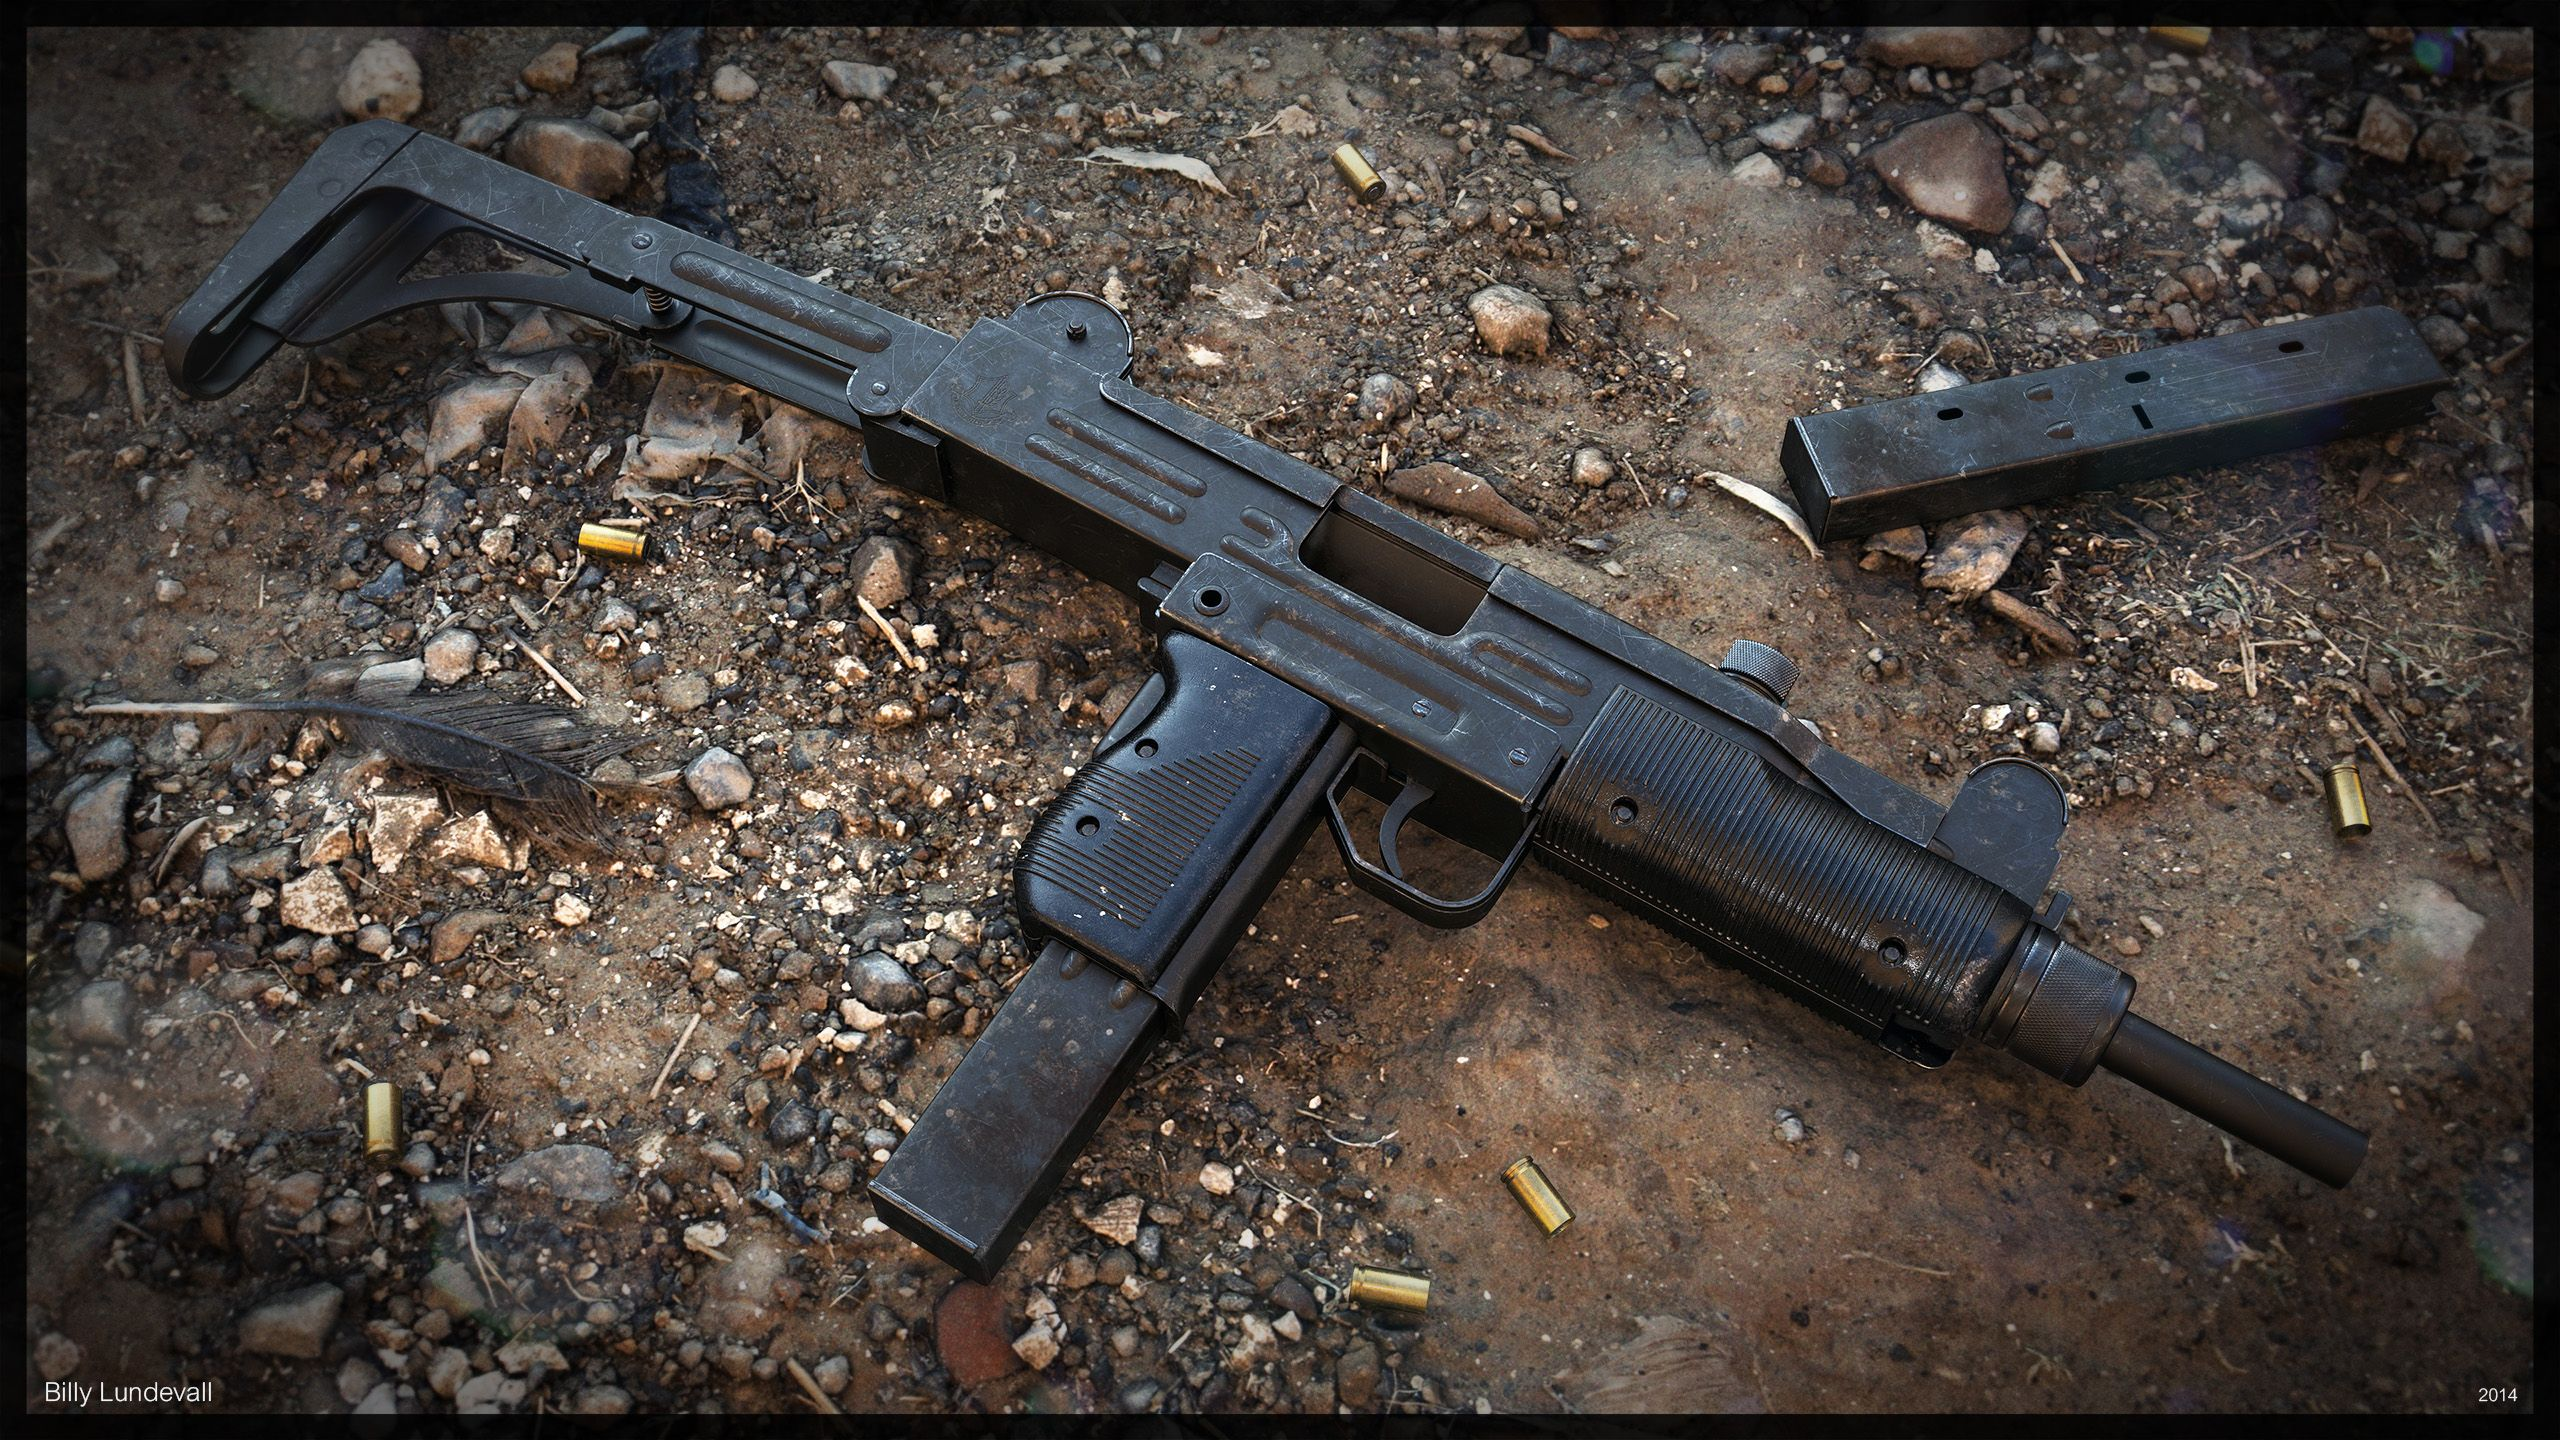 For sale trade imi uzi carbine made in israel 9mm - Imi Uzi Sub Machine Gun By Billy Lundevall Guns Pinterest Machine Guns And Guns